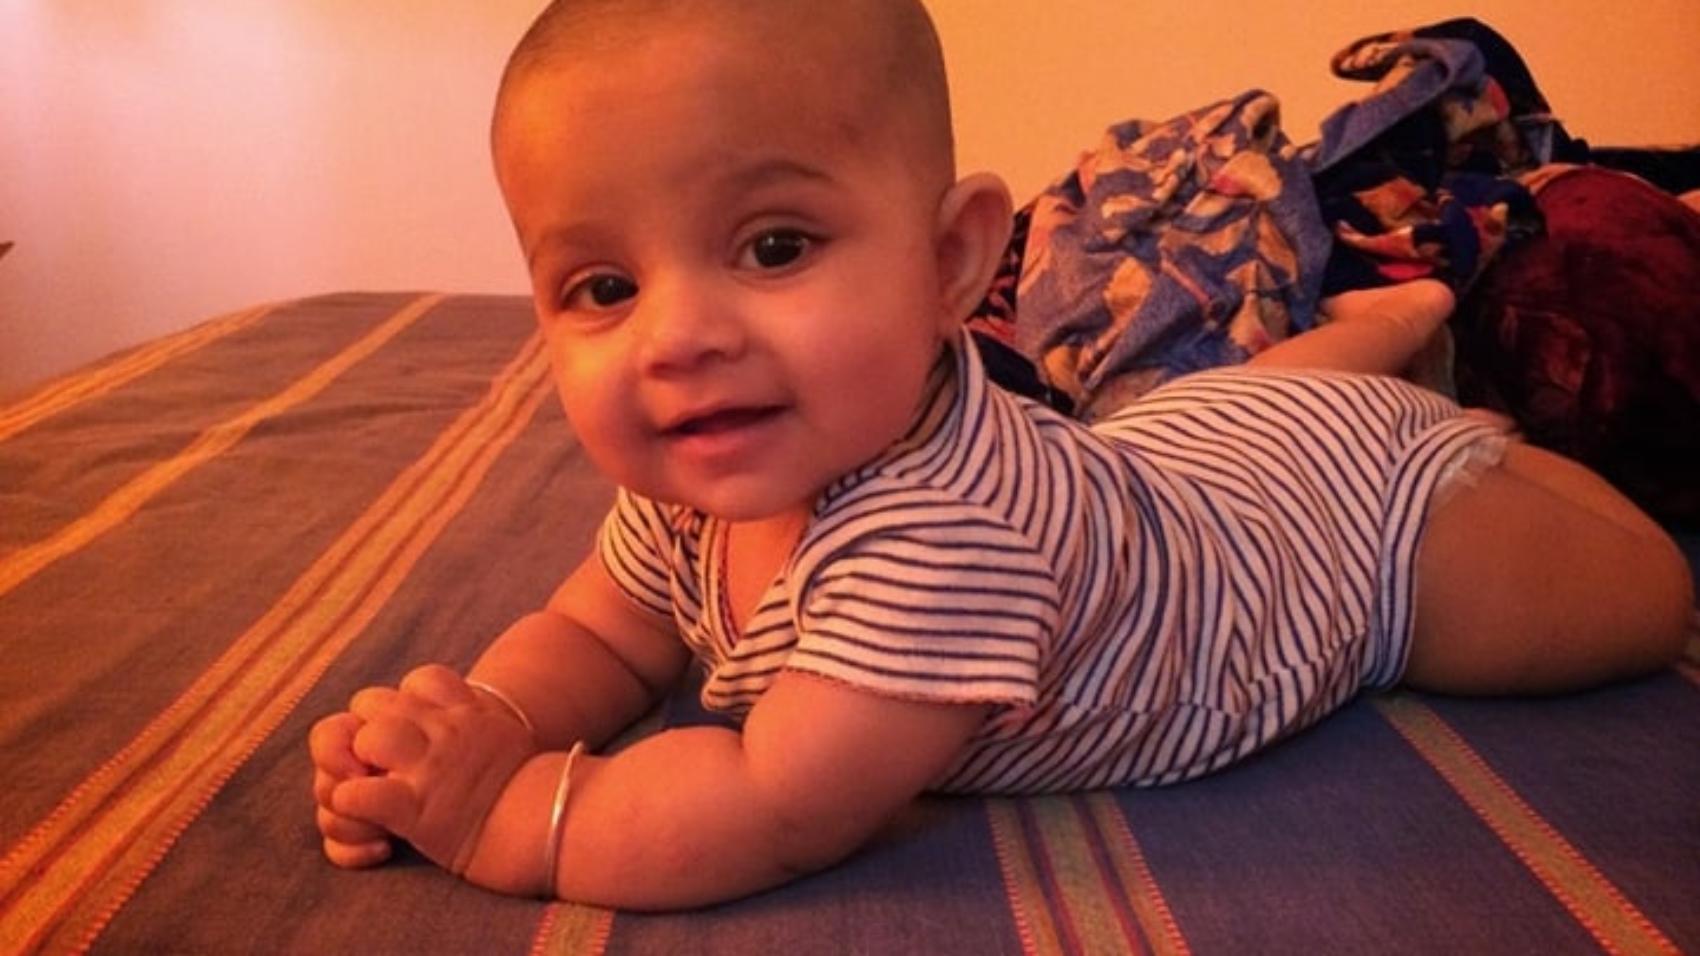 Kids' Mundan in USA Vs India: Simplifying the Tradition of Tonsuring